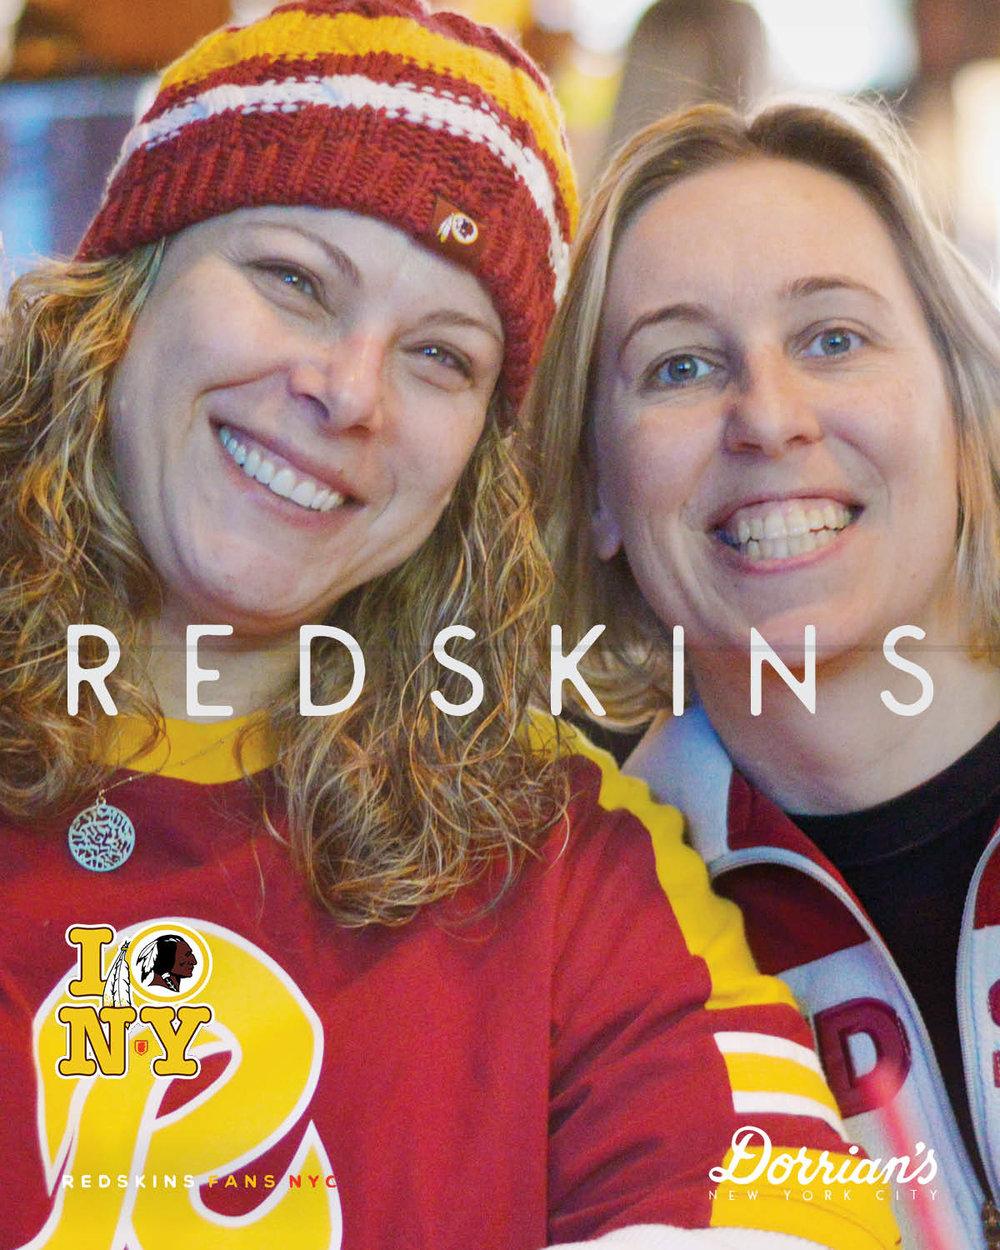 drh_nyc-2018-insta-redskins-bar-cheering-53.jpg